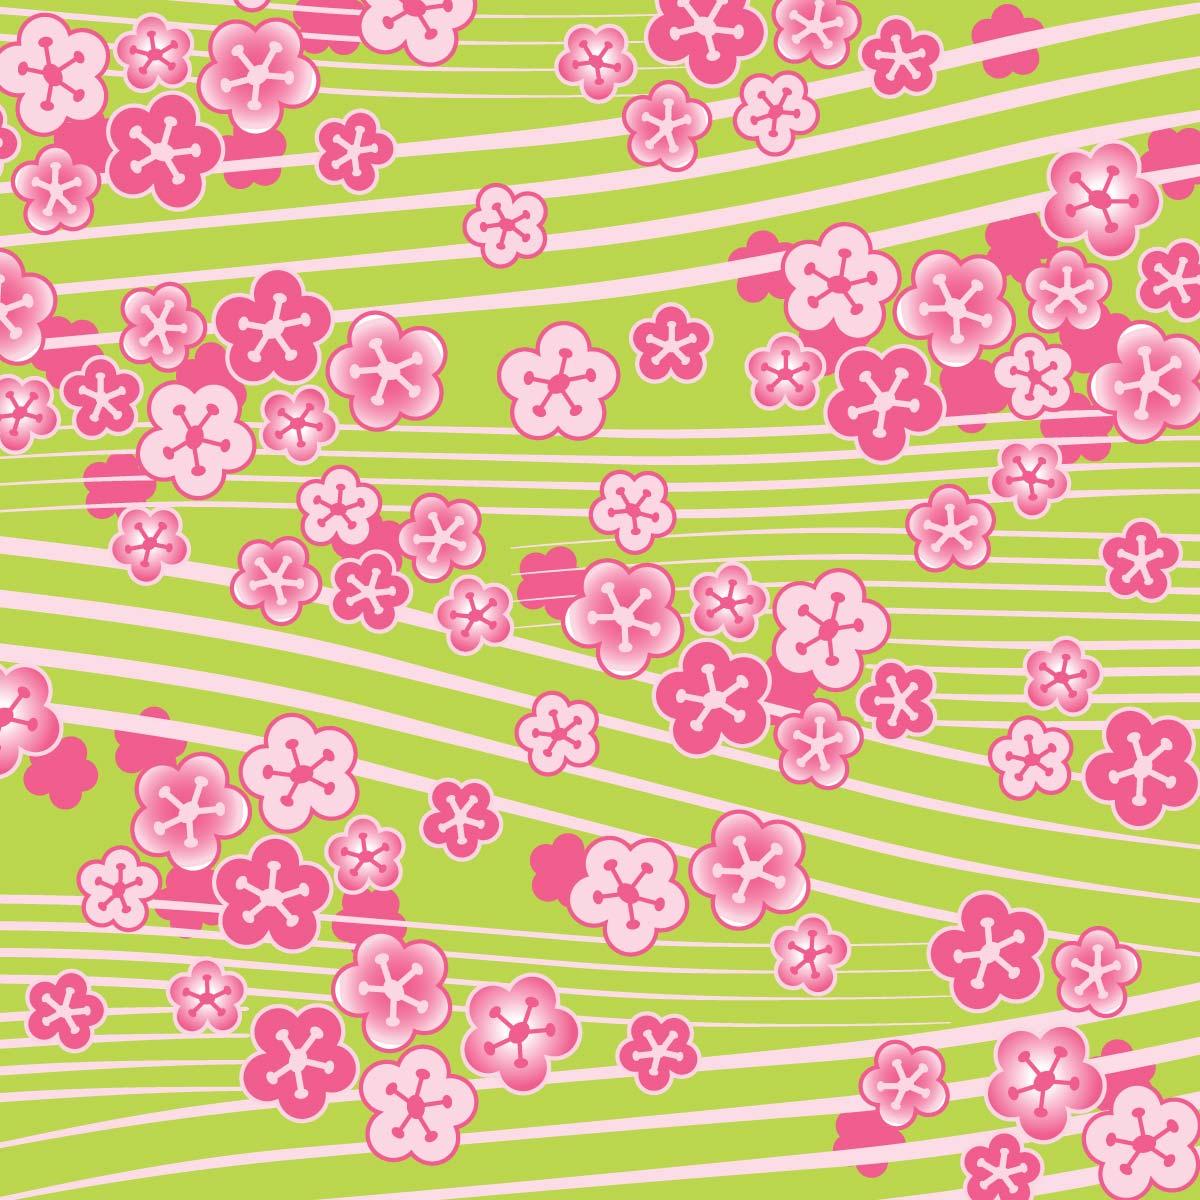 Cherry_Blossoms-01.jpg